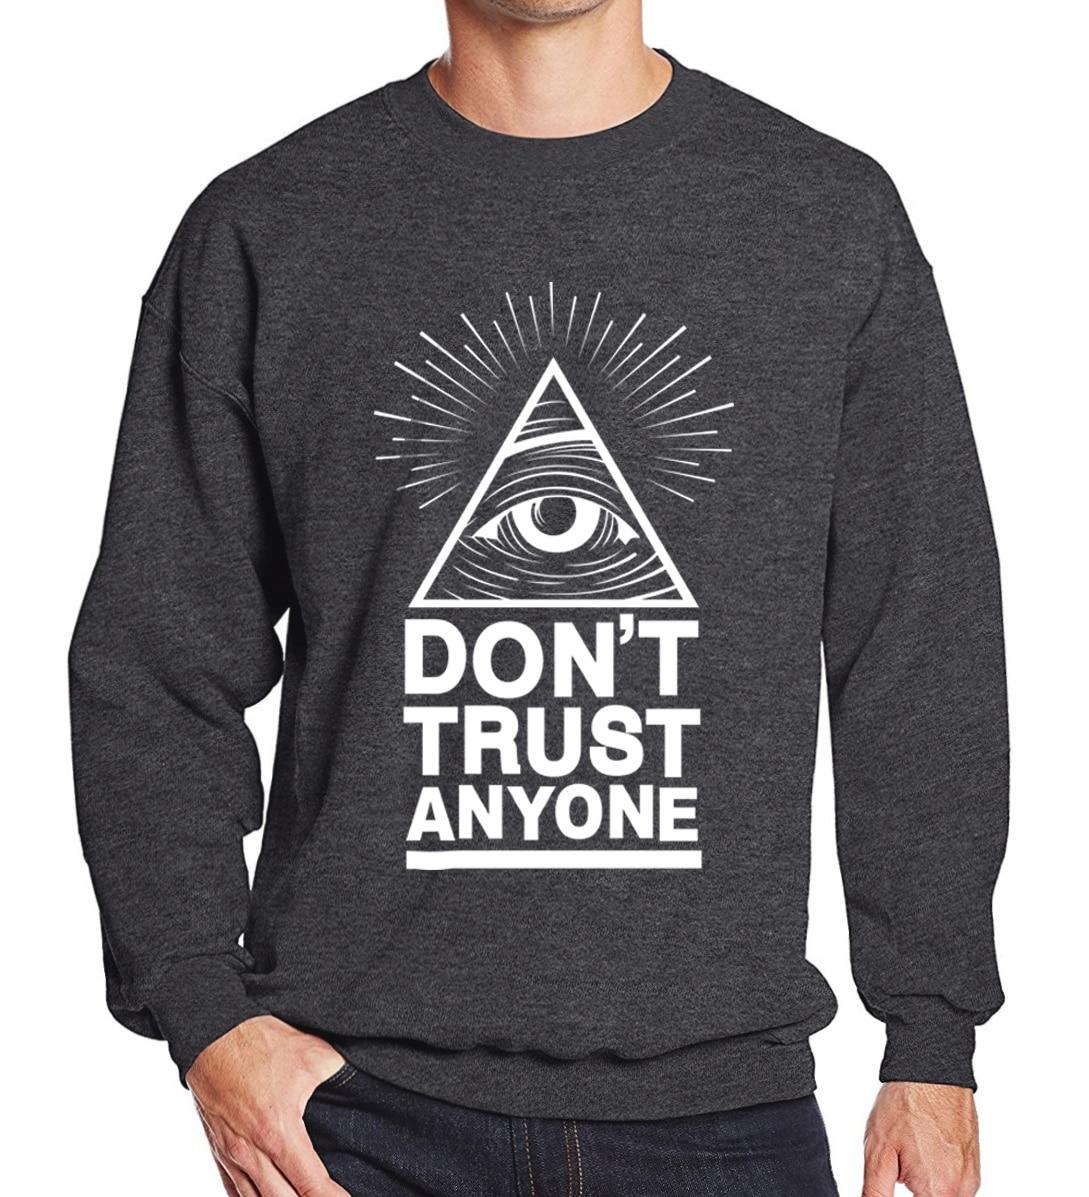 2019 Hoodies Men Sweatshirt Spring Winter Dont Trust Anyone Illuminati All Seeing Eye Printed Fashion Cool Men's Sportwear Kpop